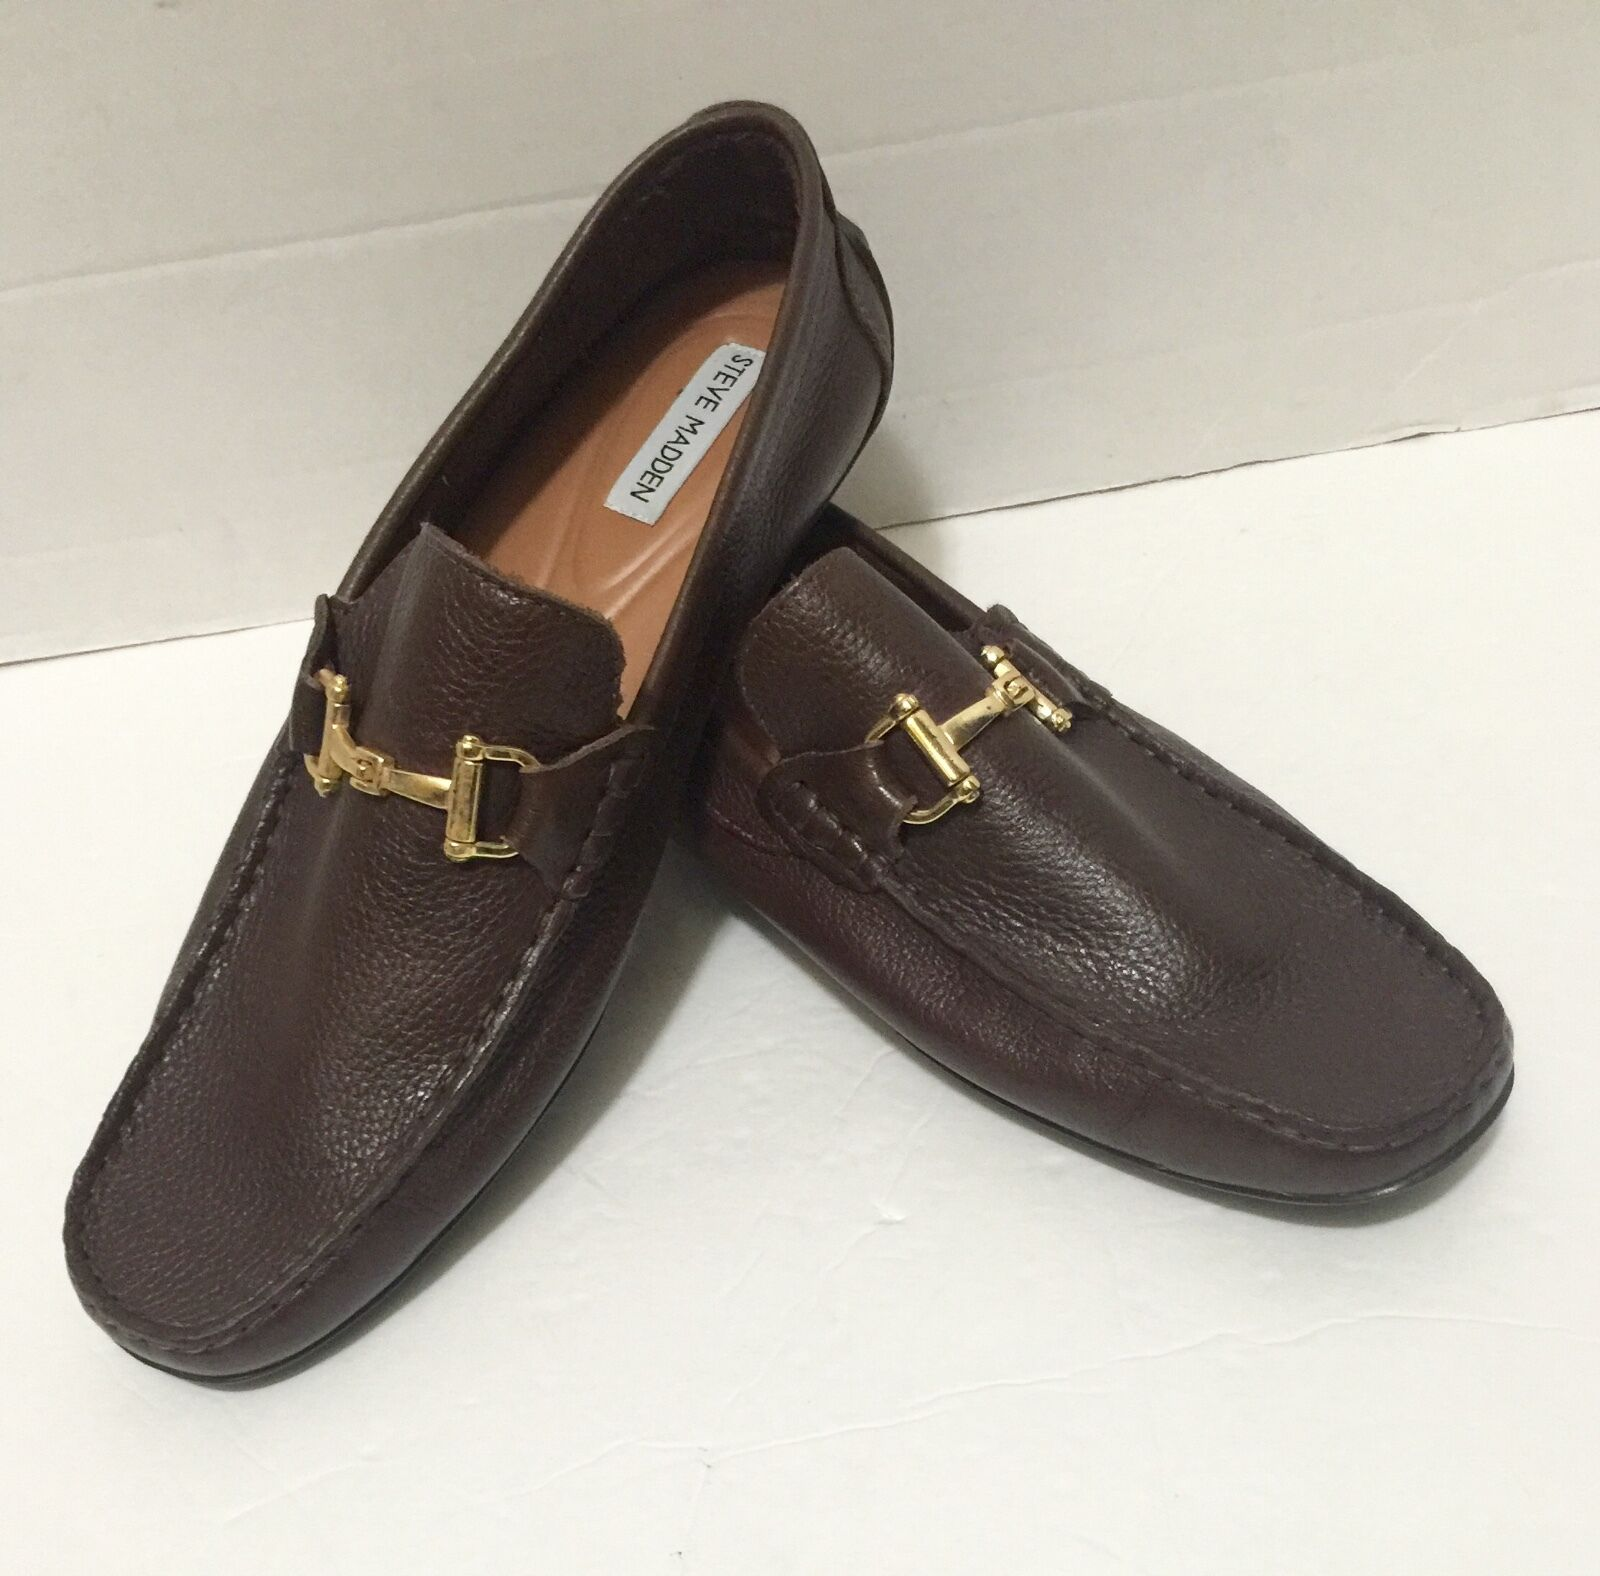 Steve Madden Zorzi Brown Driving Pelle Loafers Shoes 11.5